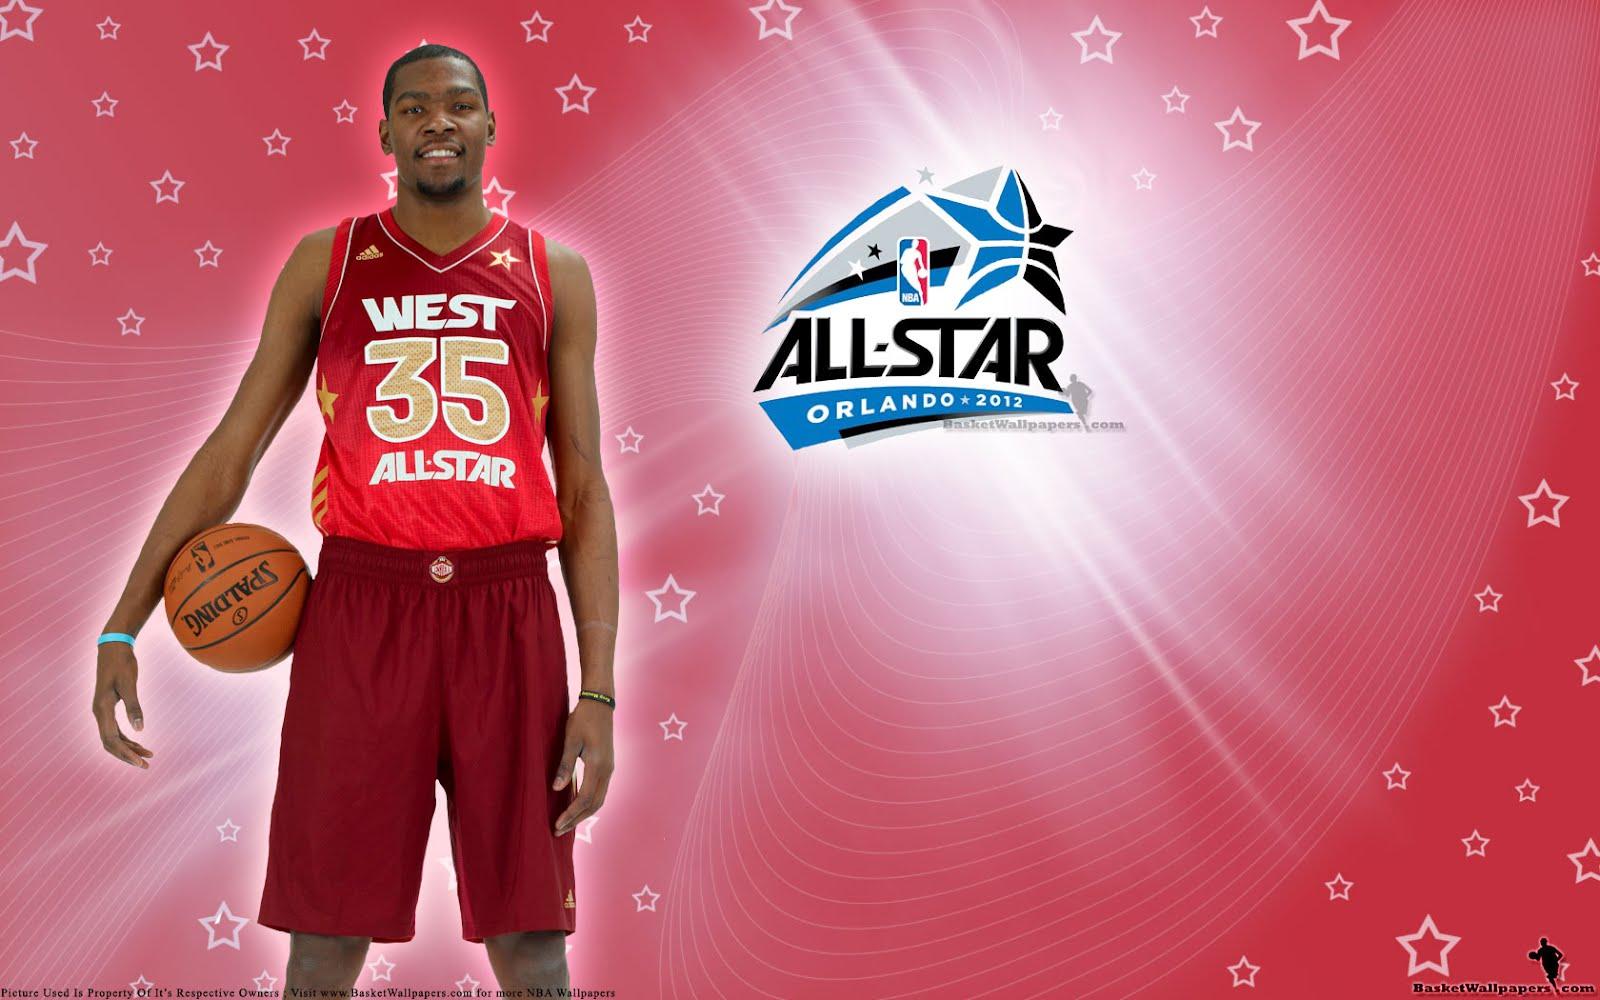 Sport Live WEST 2012 NBA All Star Wallpaper 1600x1000